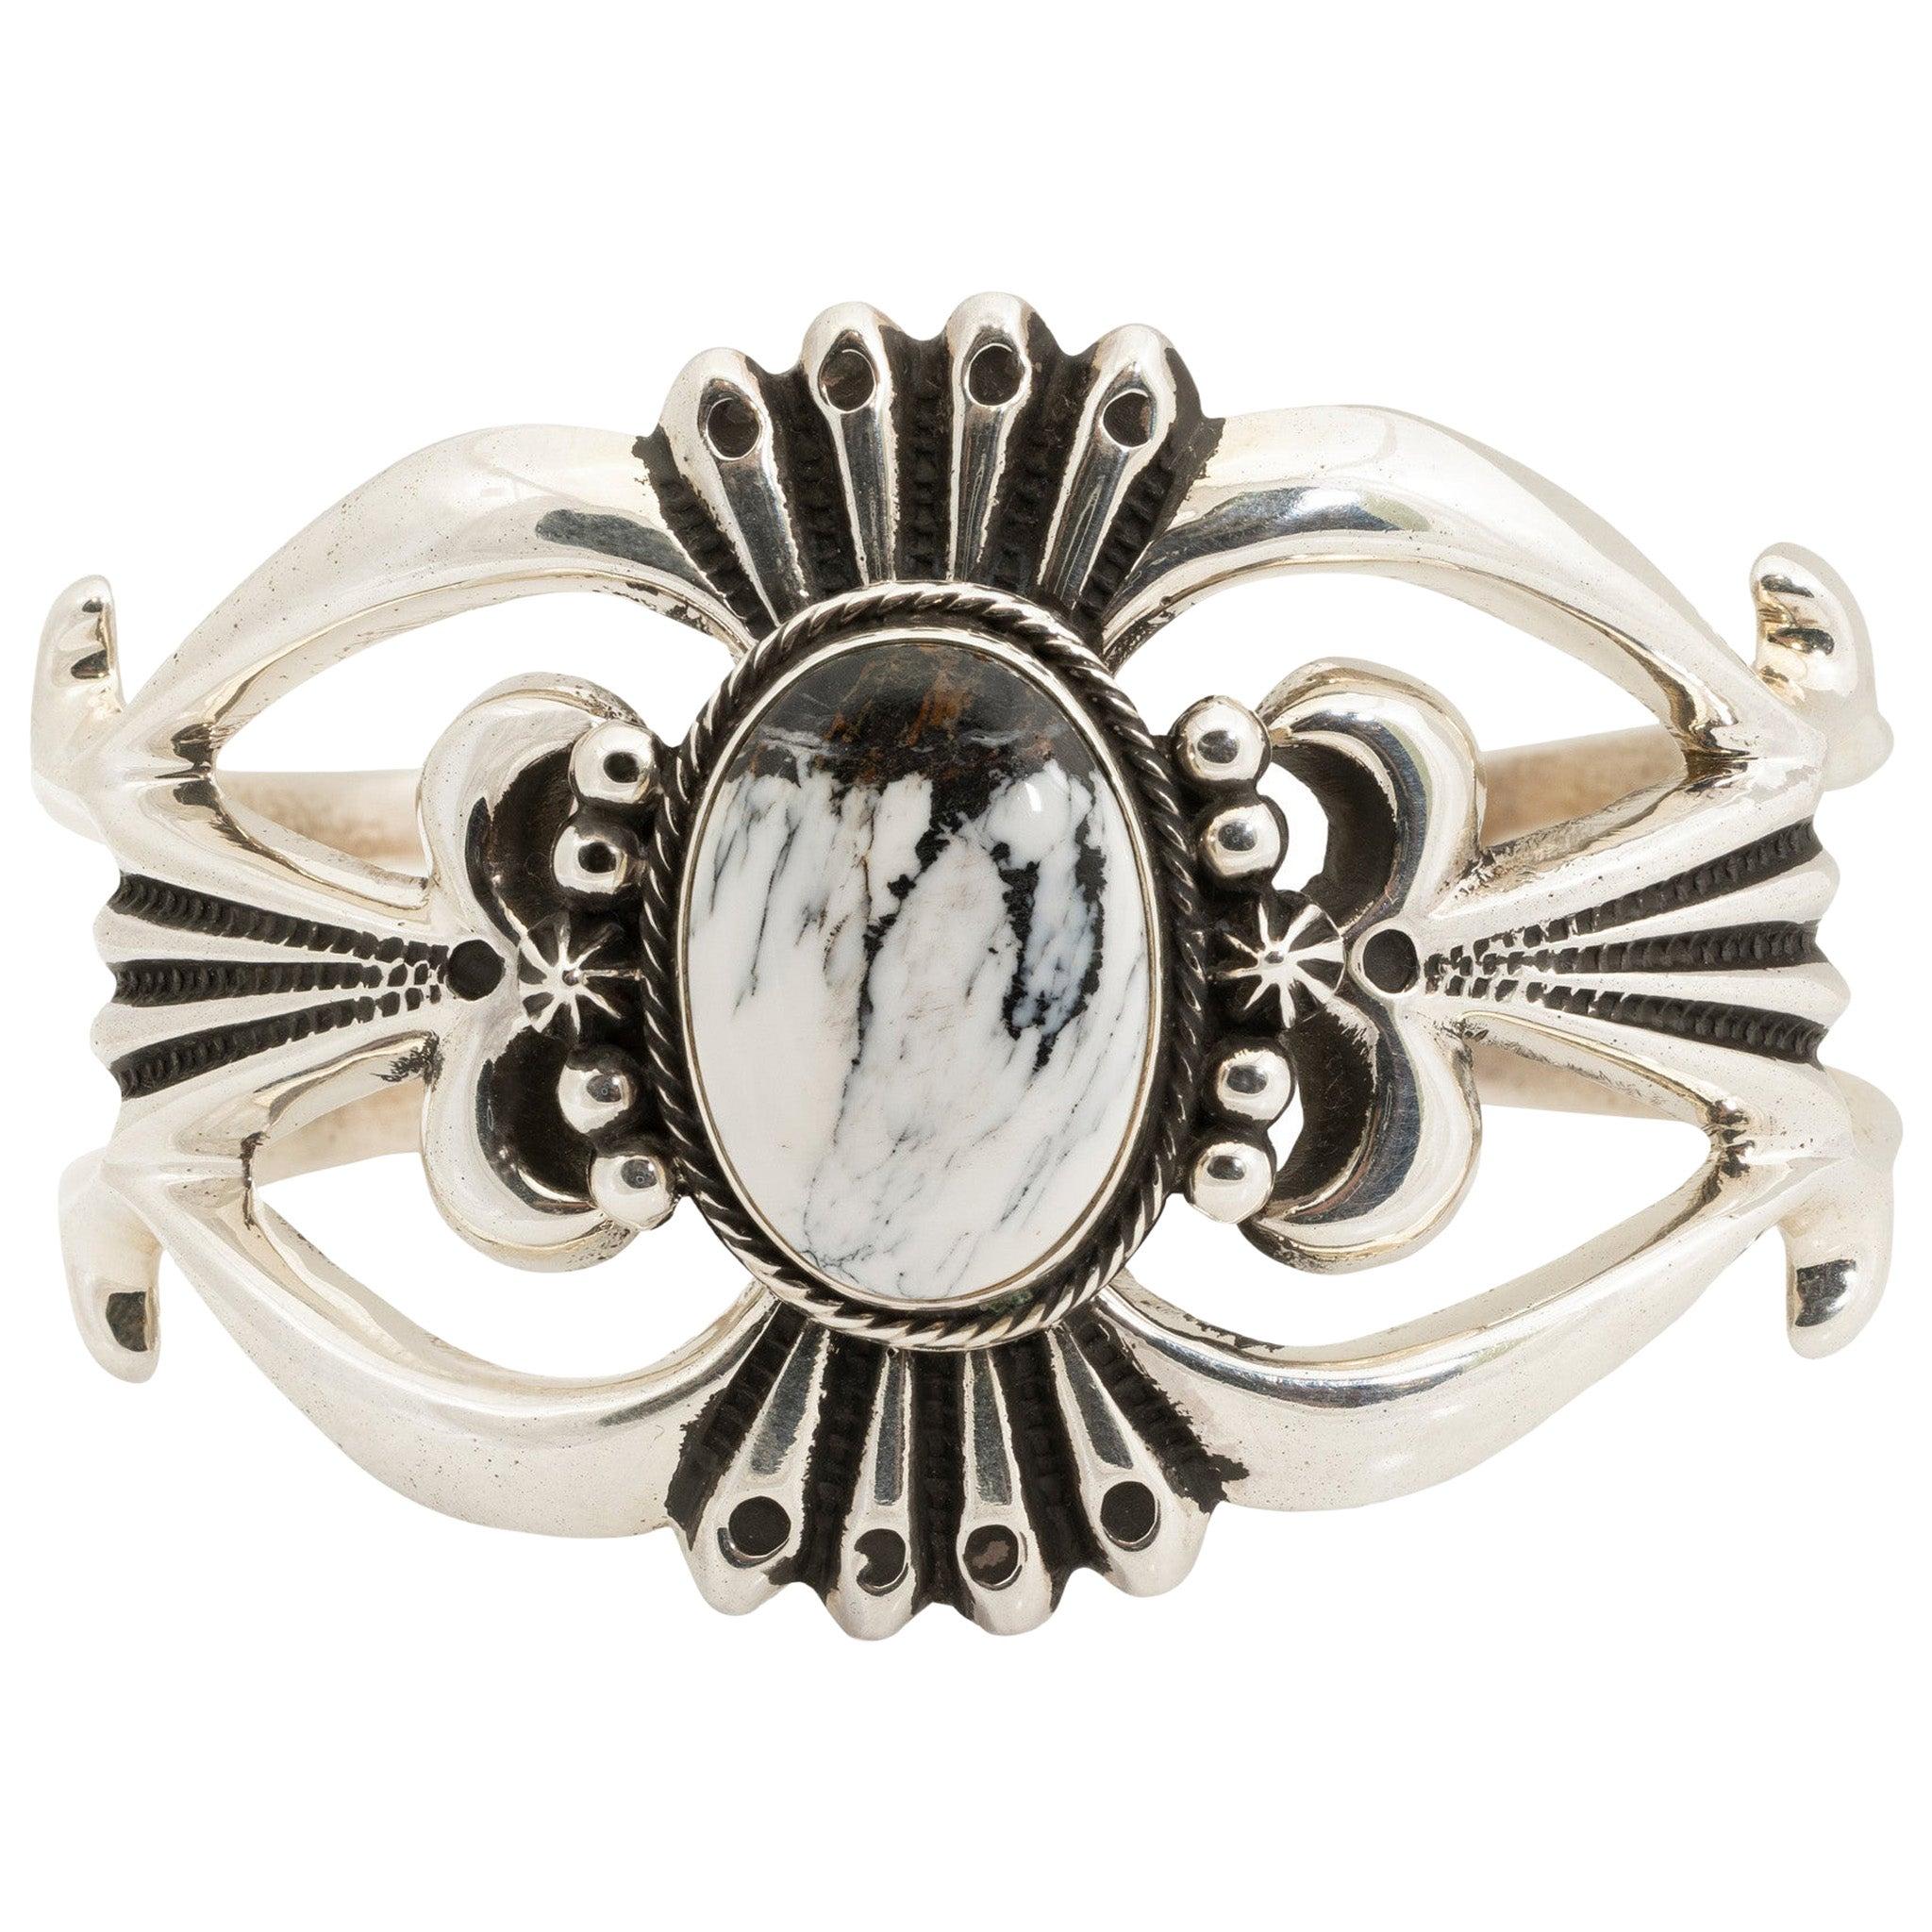 Navajo White Buffalo Turquoise Cuff Bracelet